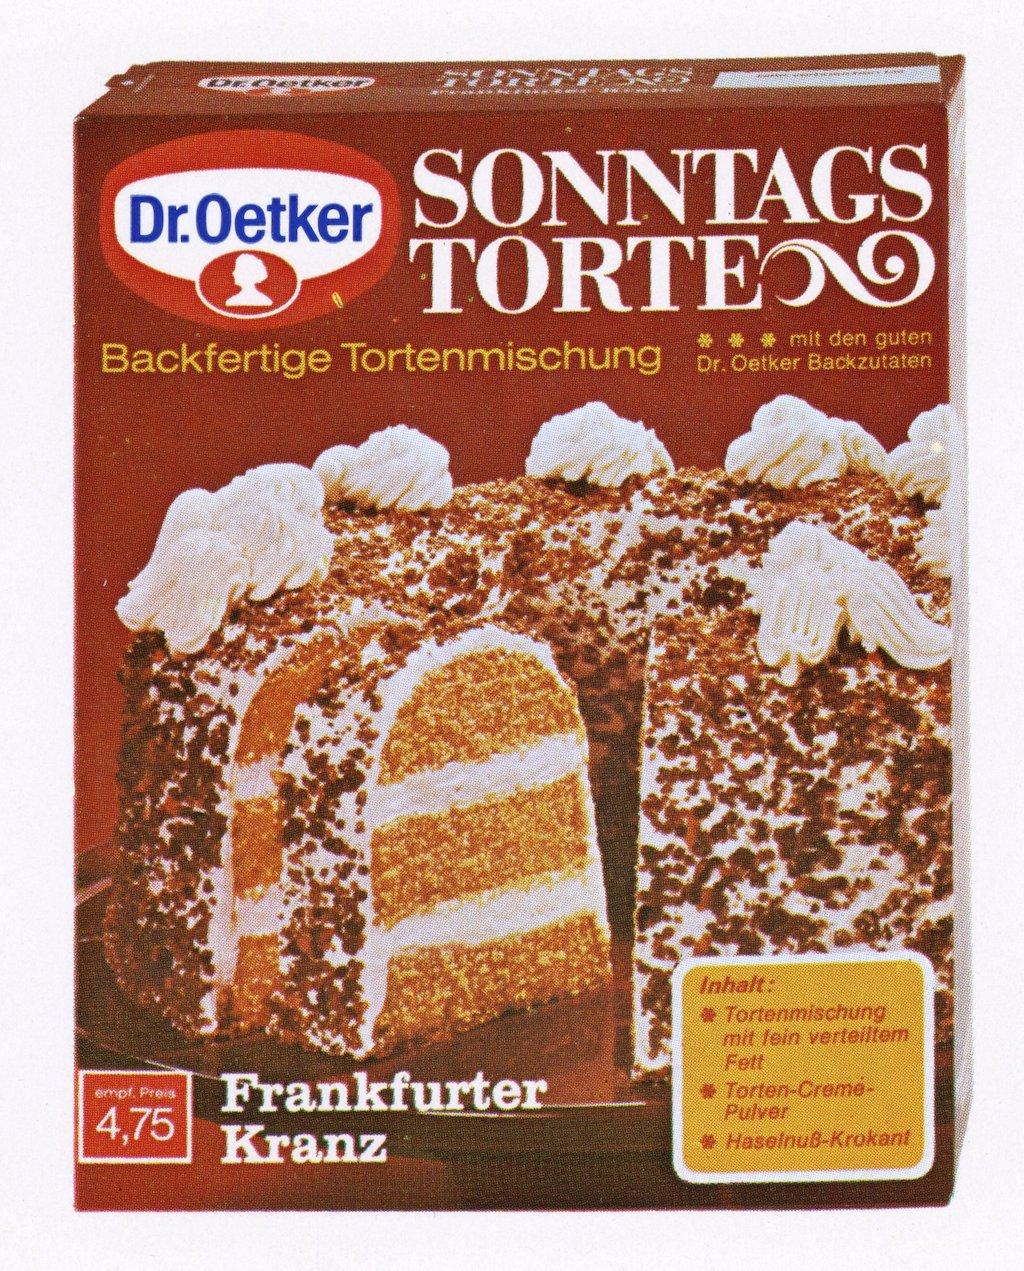 Dr. Oetker 1971 Erstes Backmischung Sonntagstorte Frankfurter Kranz